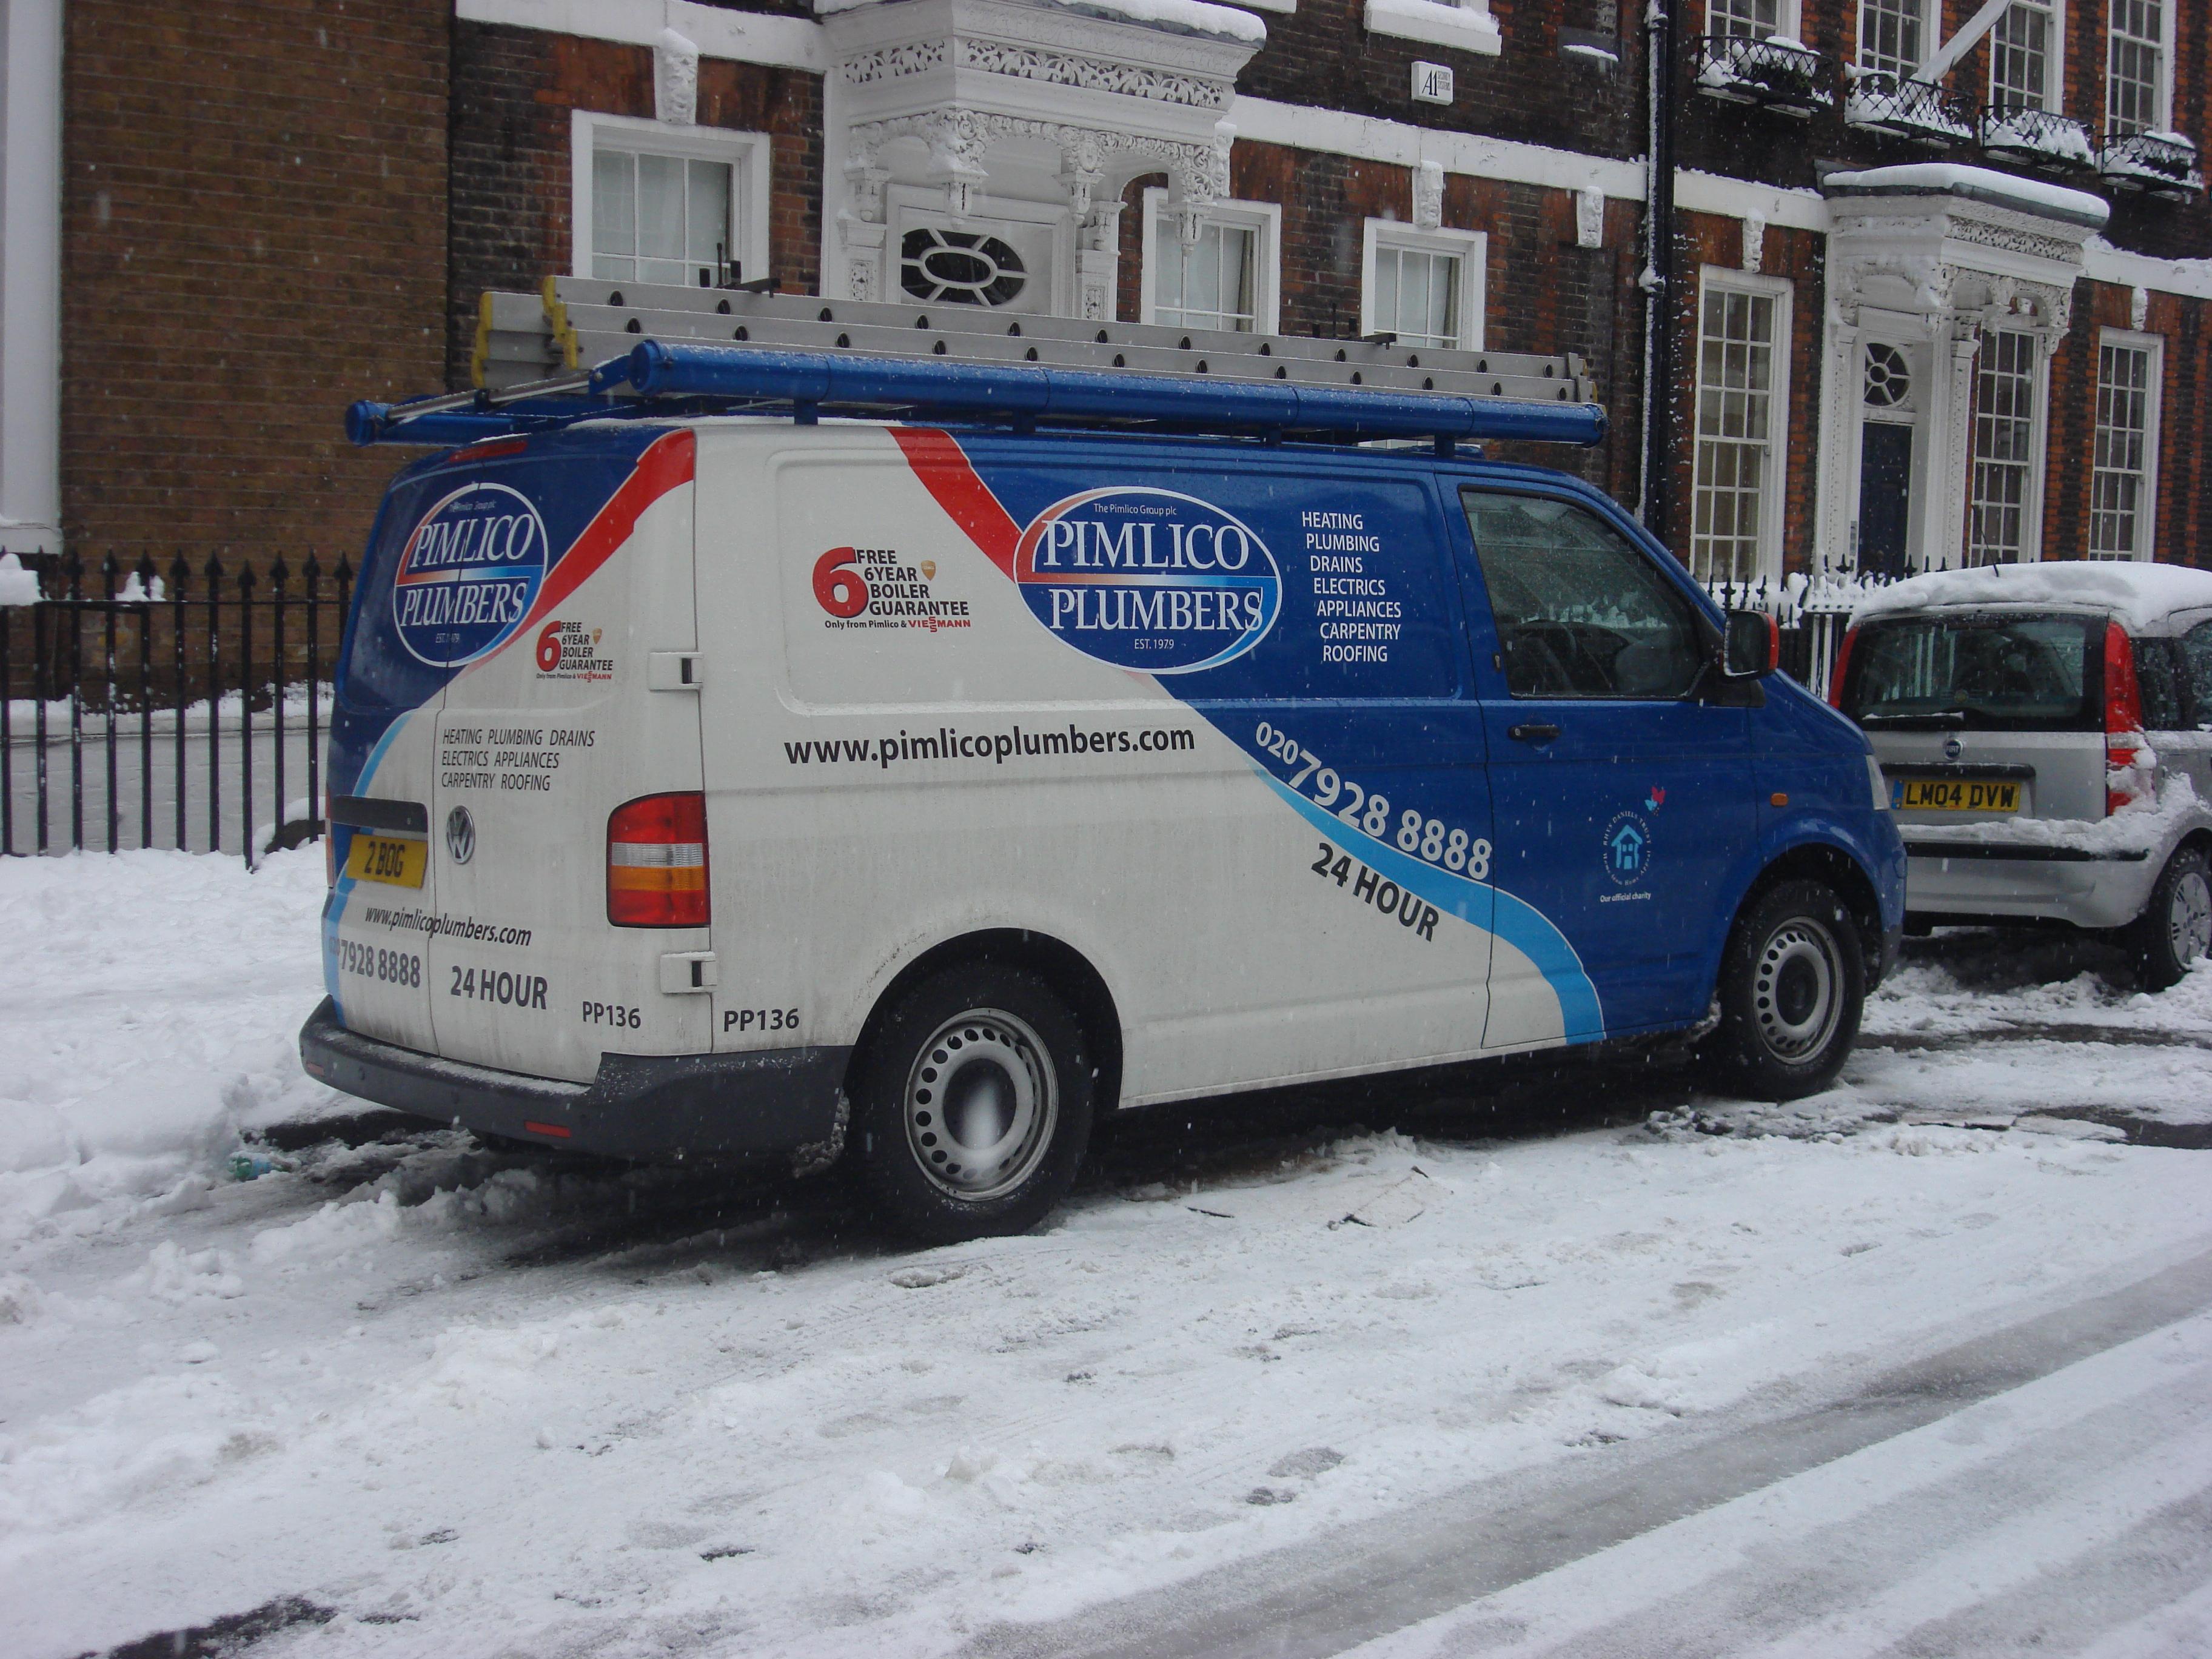 File:Pimlico Plumbers van 2.jpg - Wikimedia Commons